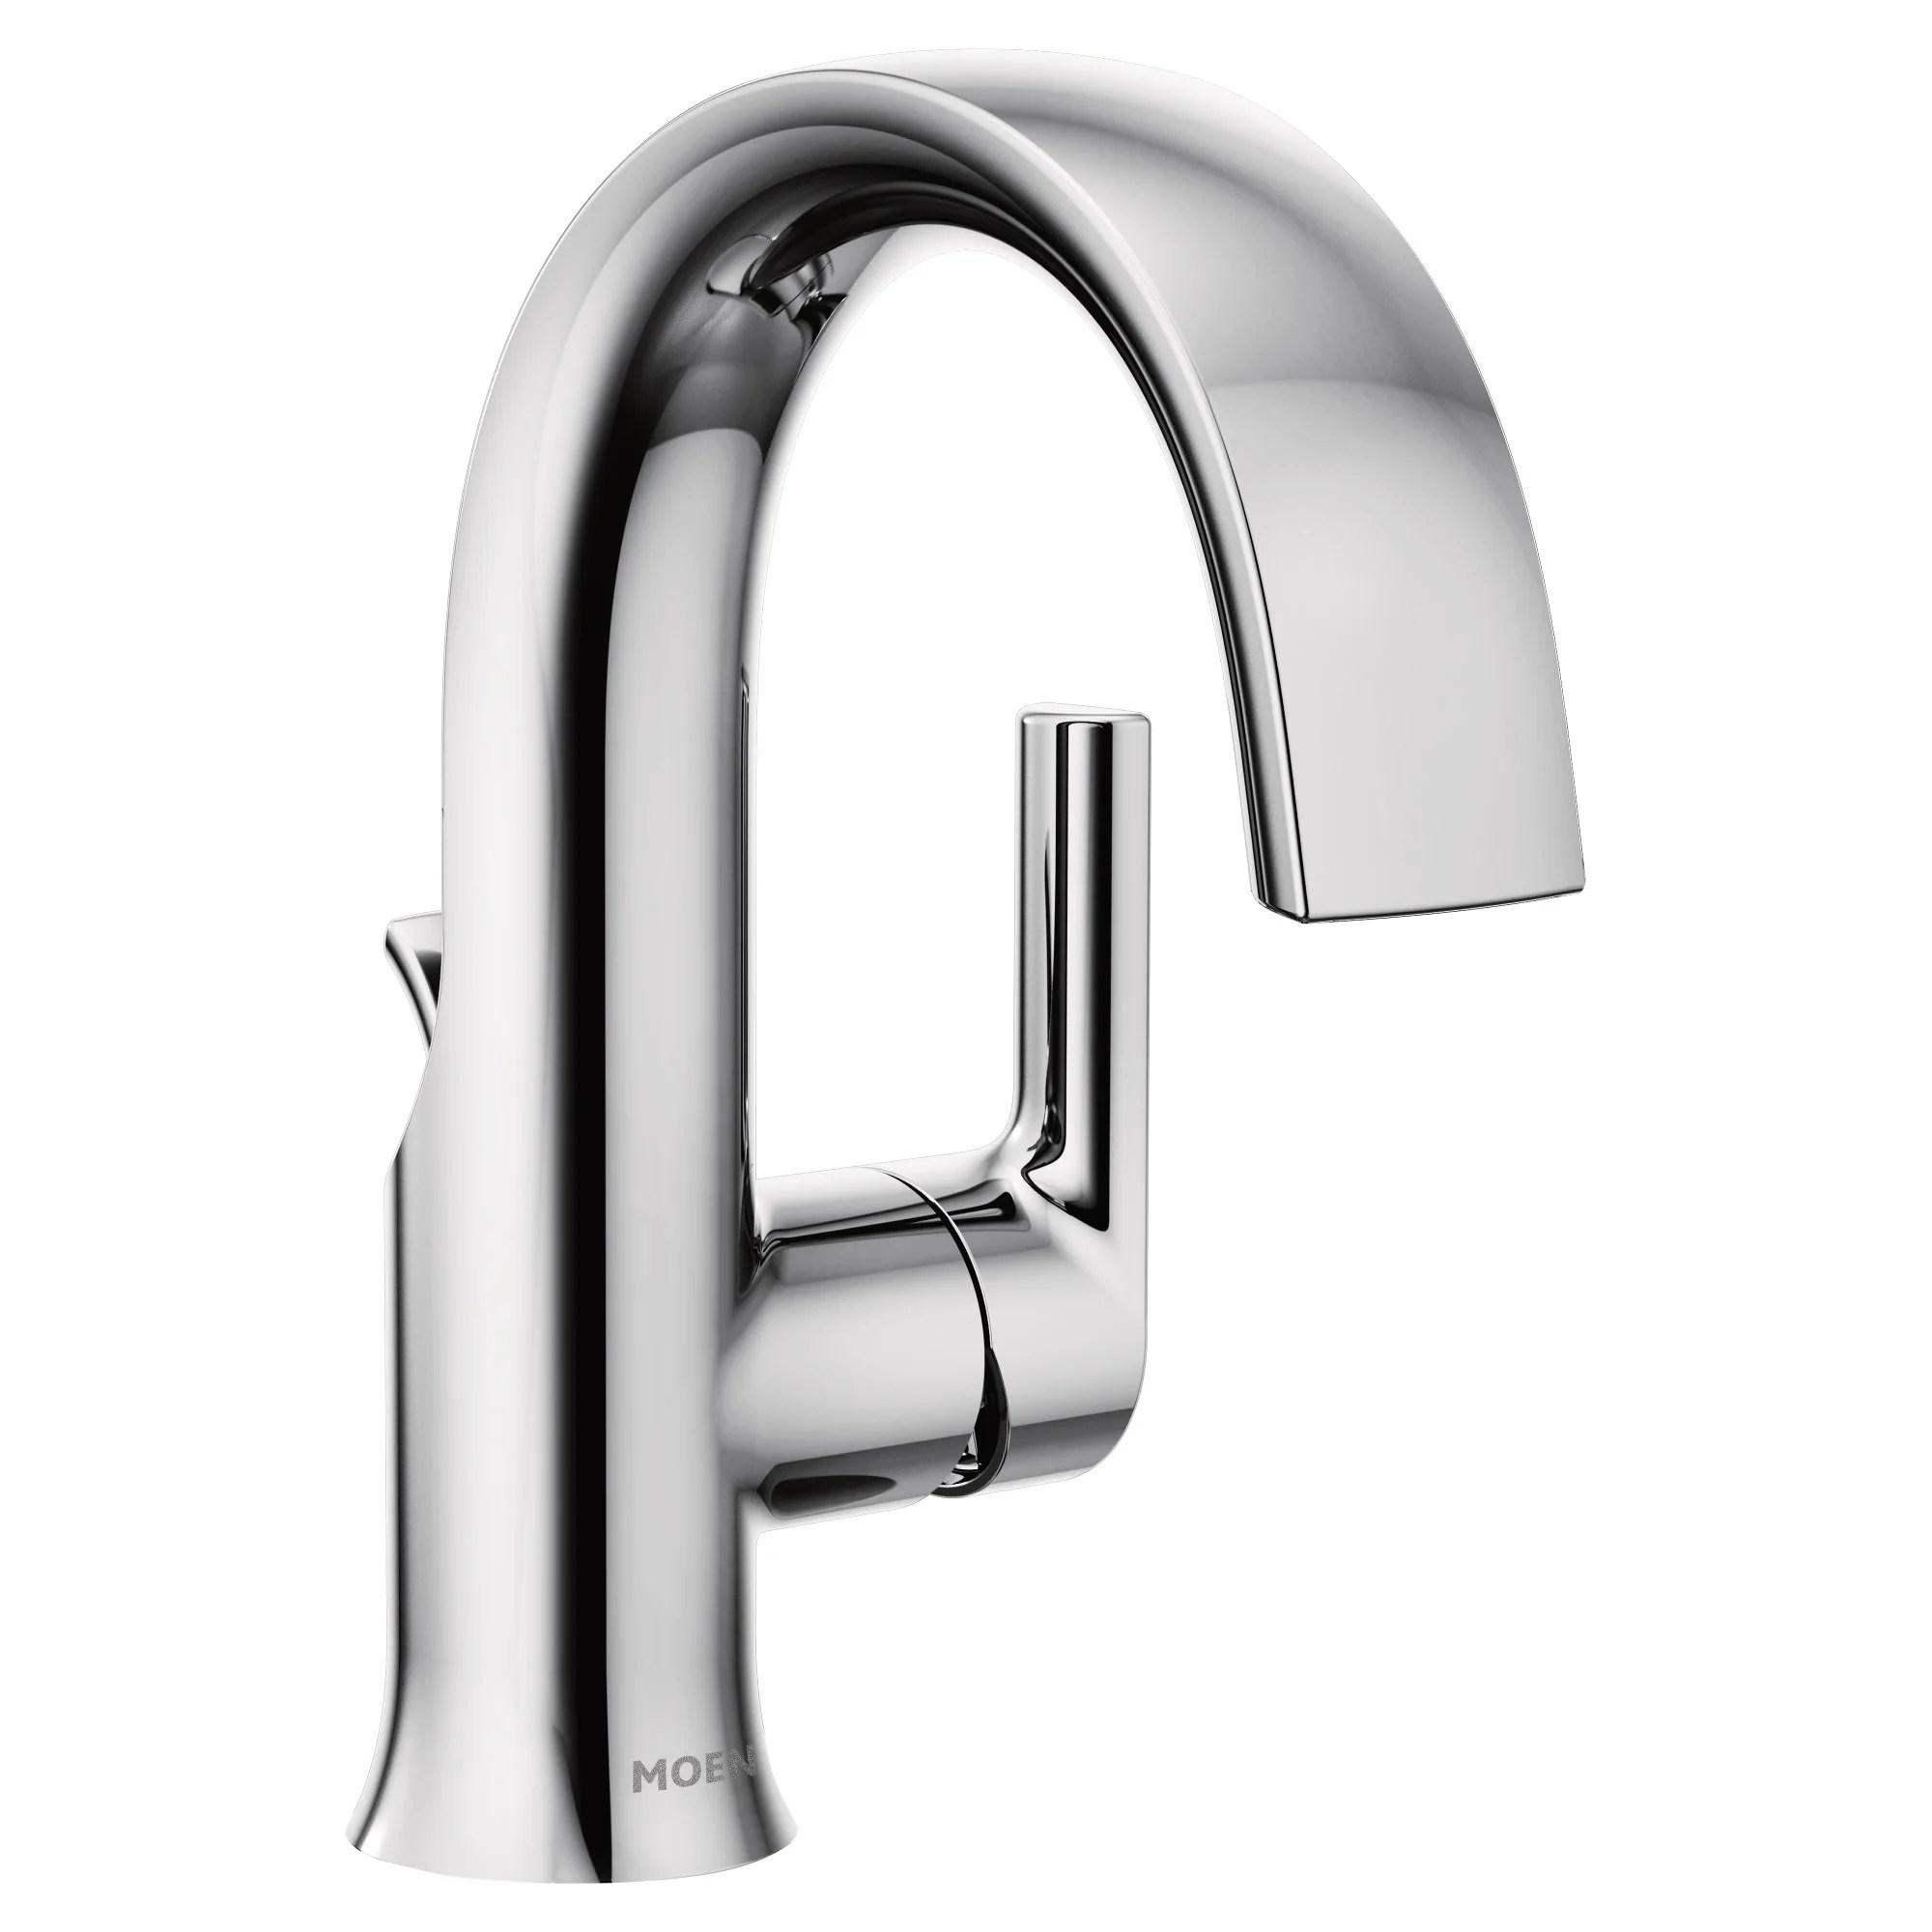 moen s6910 doux 1 2 gpm single hole bathroom faucet with pop up drain